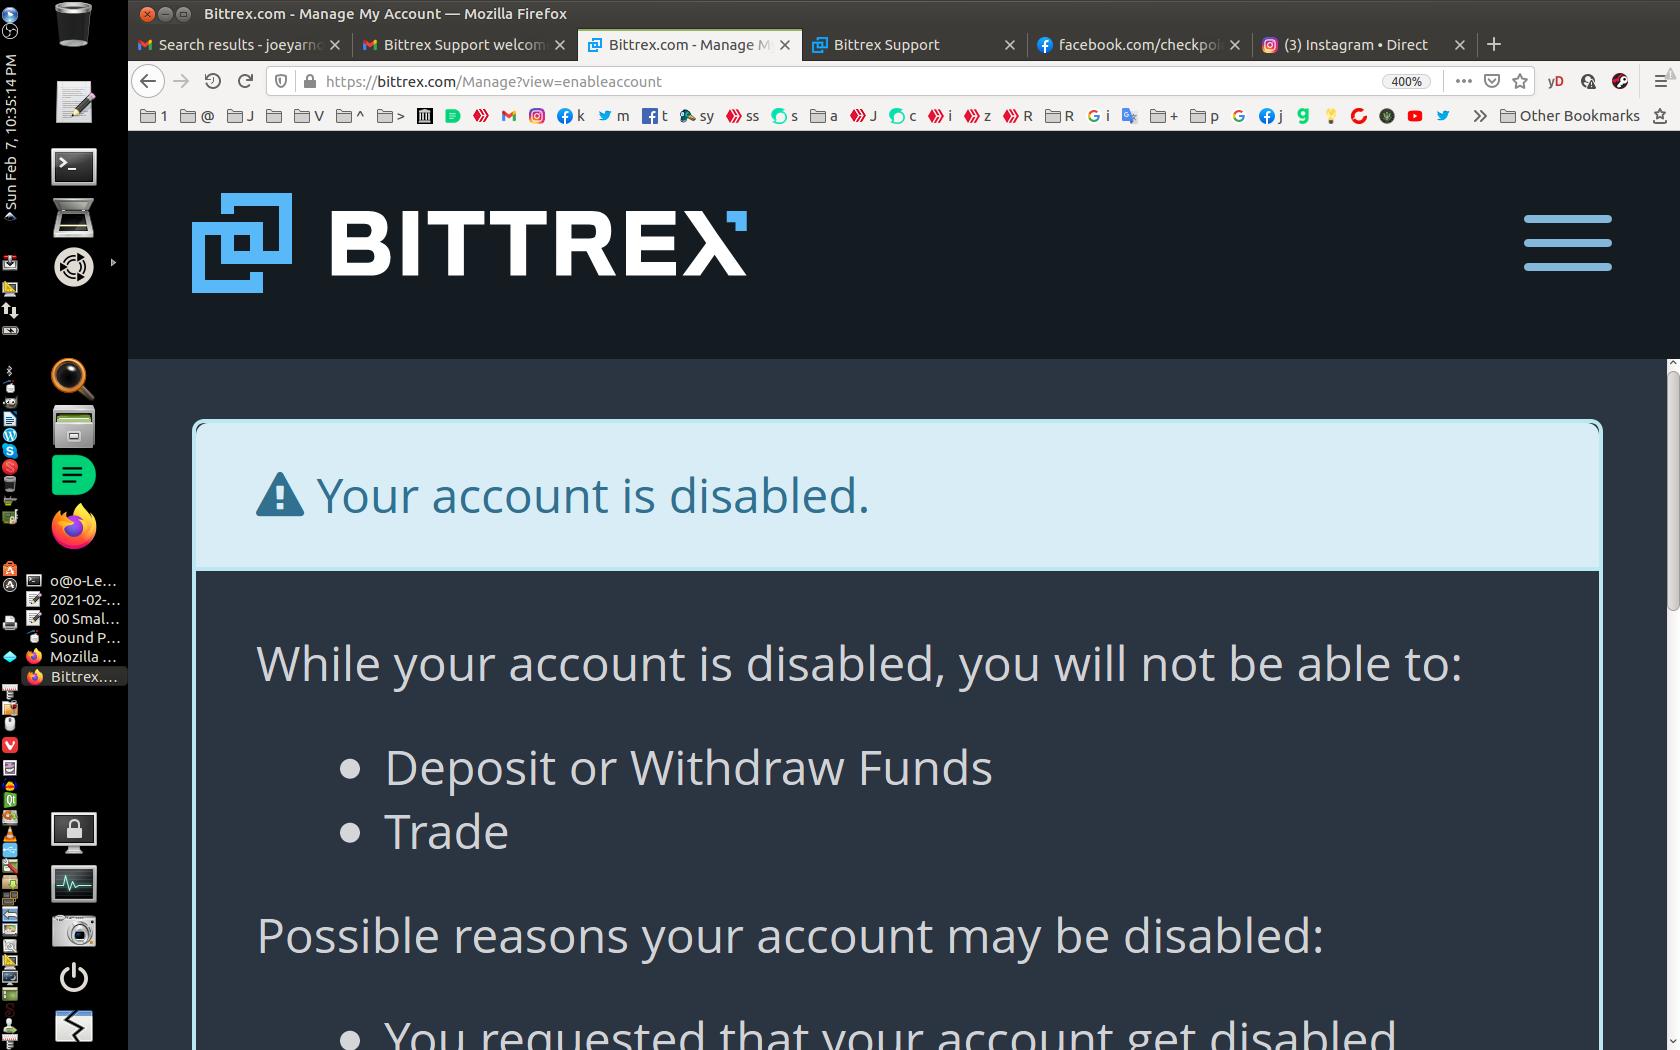 Screenshot at 2021-02-07 22:35:14 Bittrex Banned.png